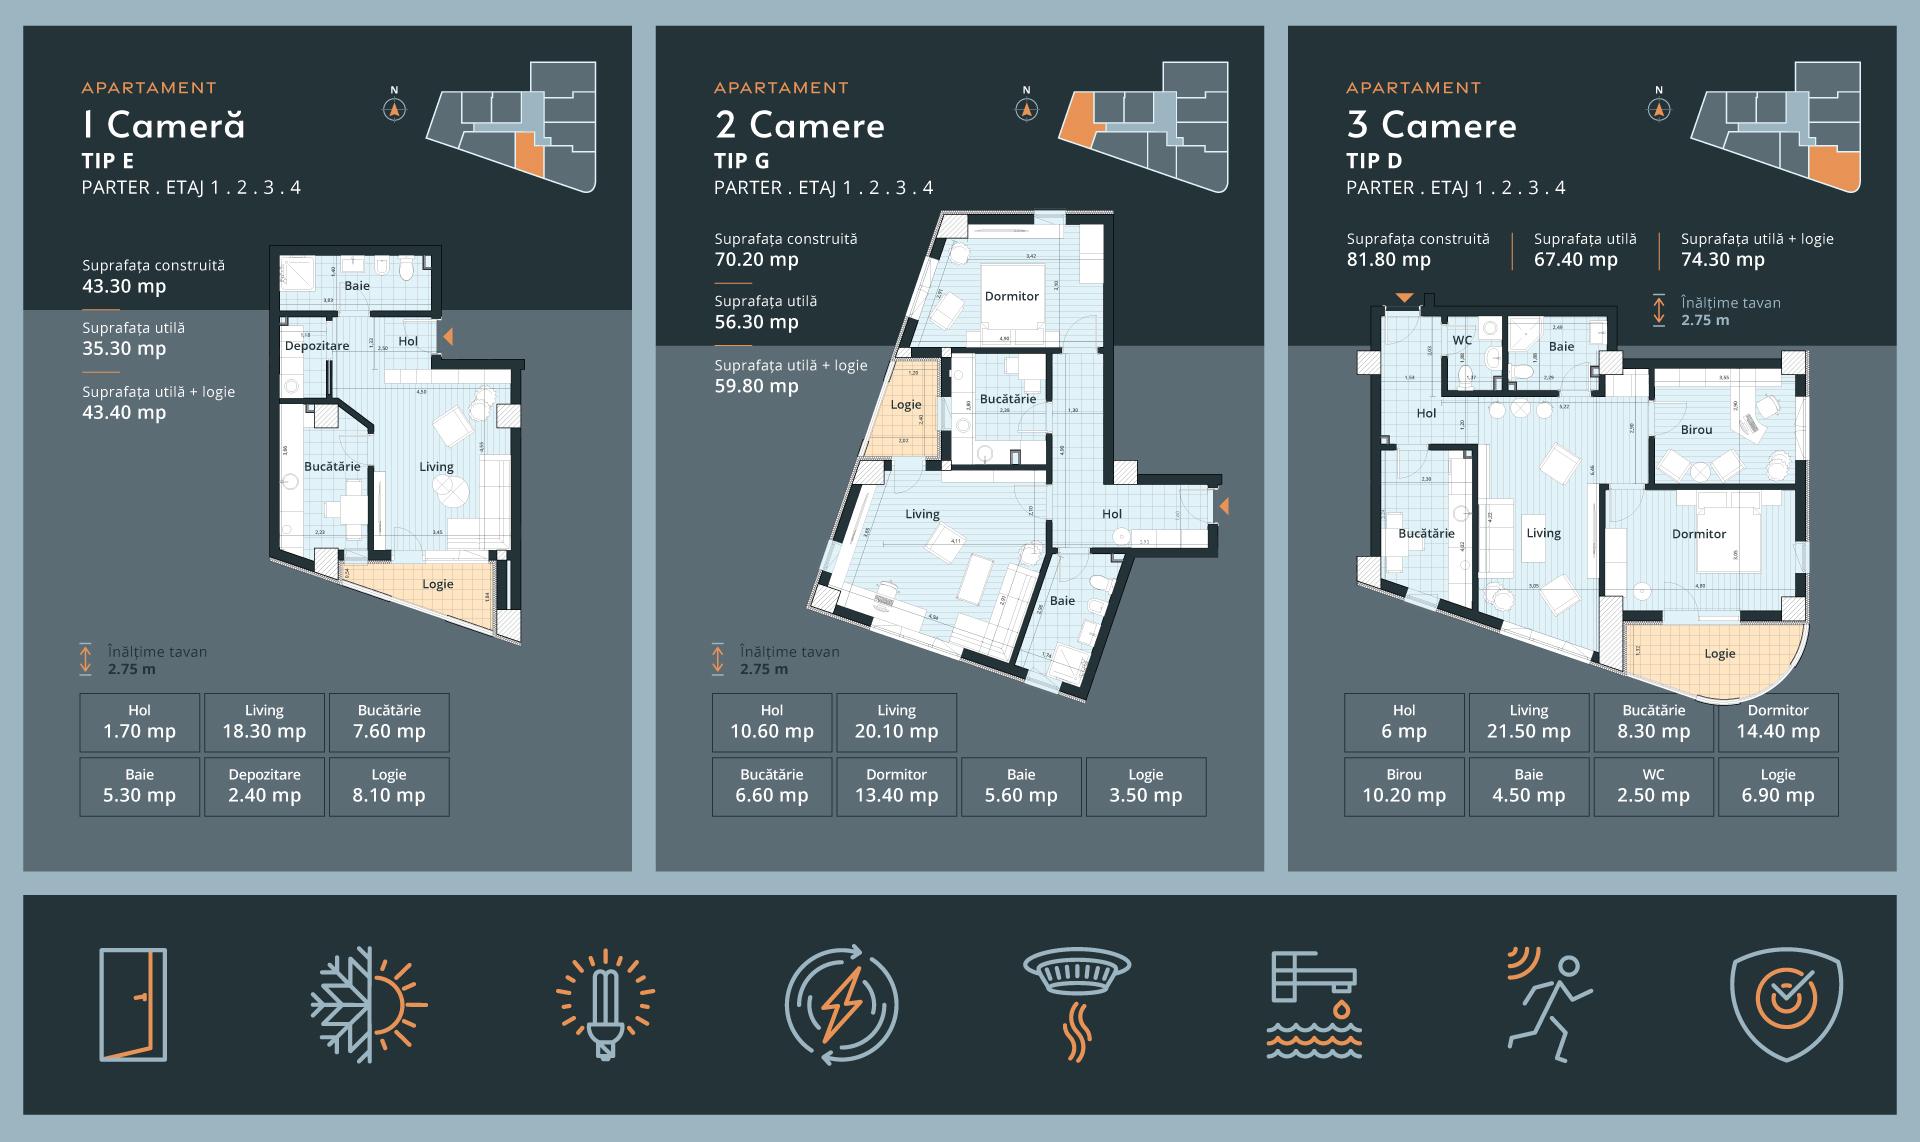 La Suite - brosura digitala de prezentare